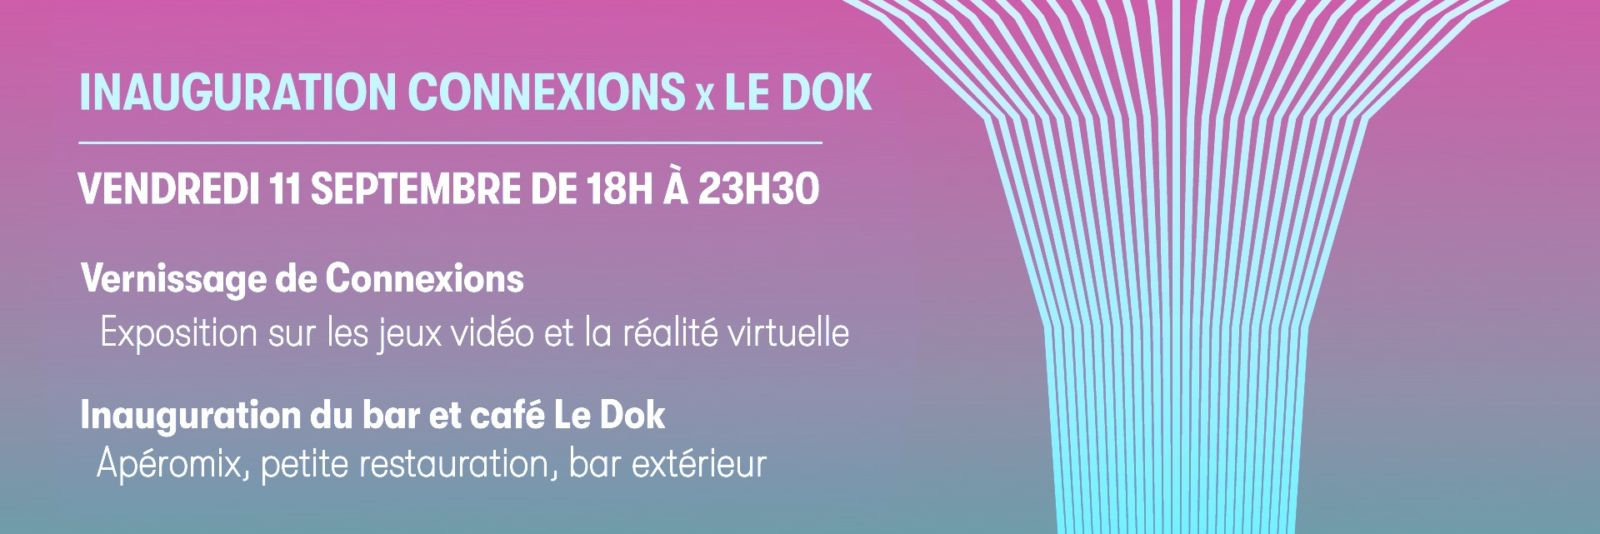 Inauguration Connexions x Le Dok